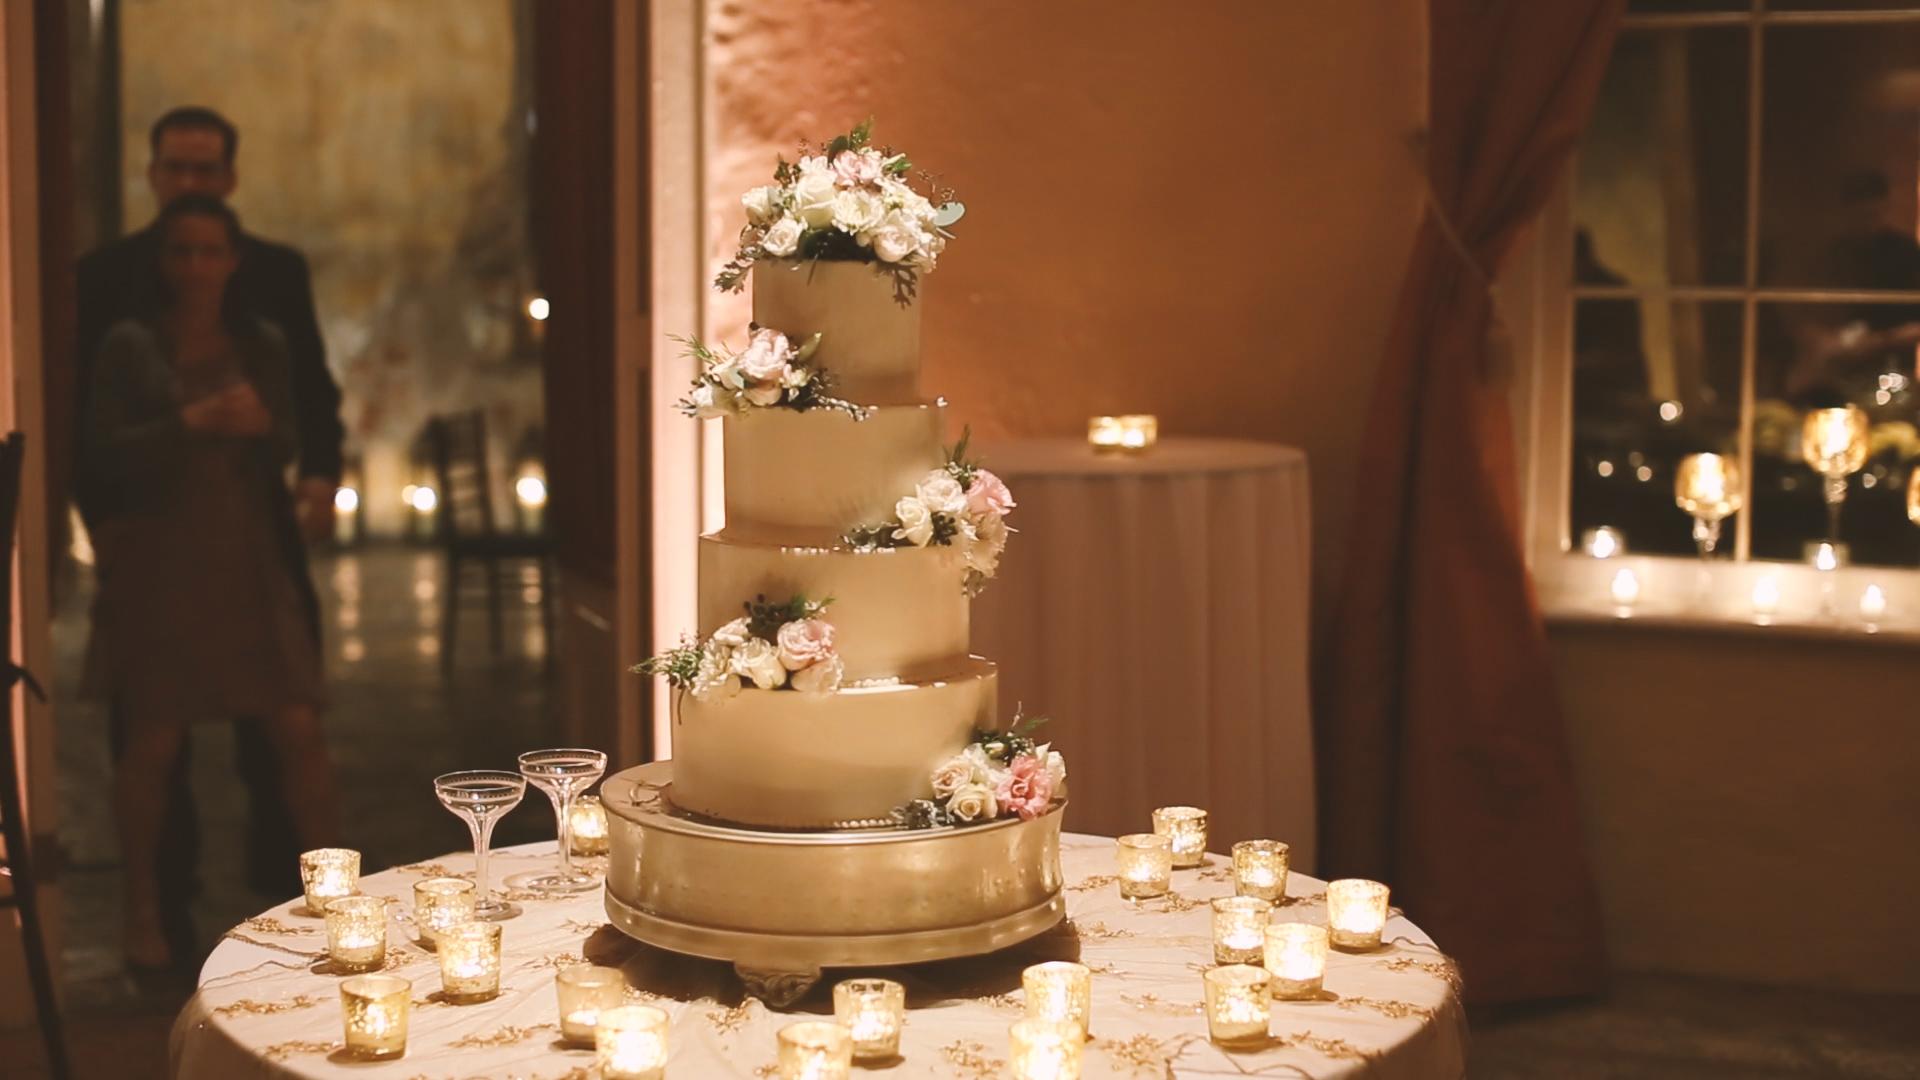 Melissa's Fine Pastries did a phenomenal job on their cake.